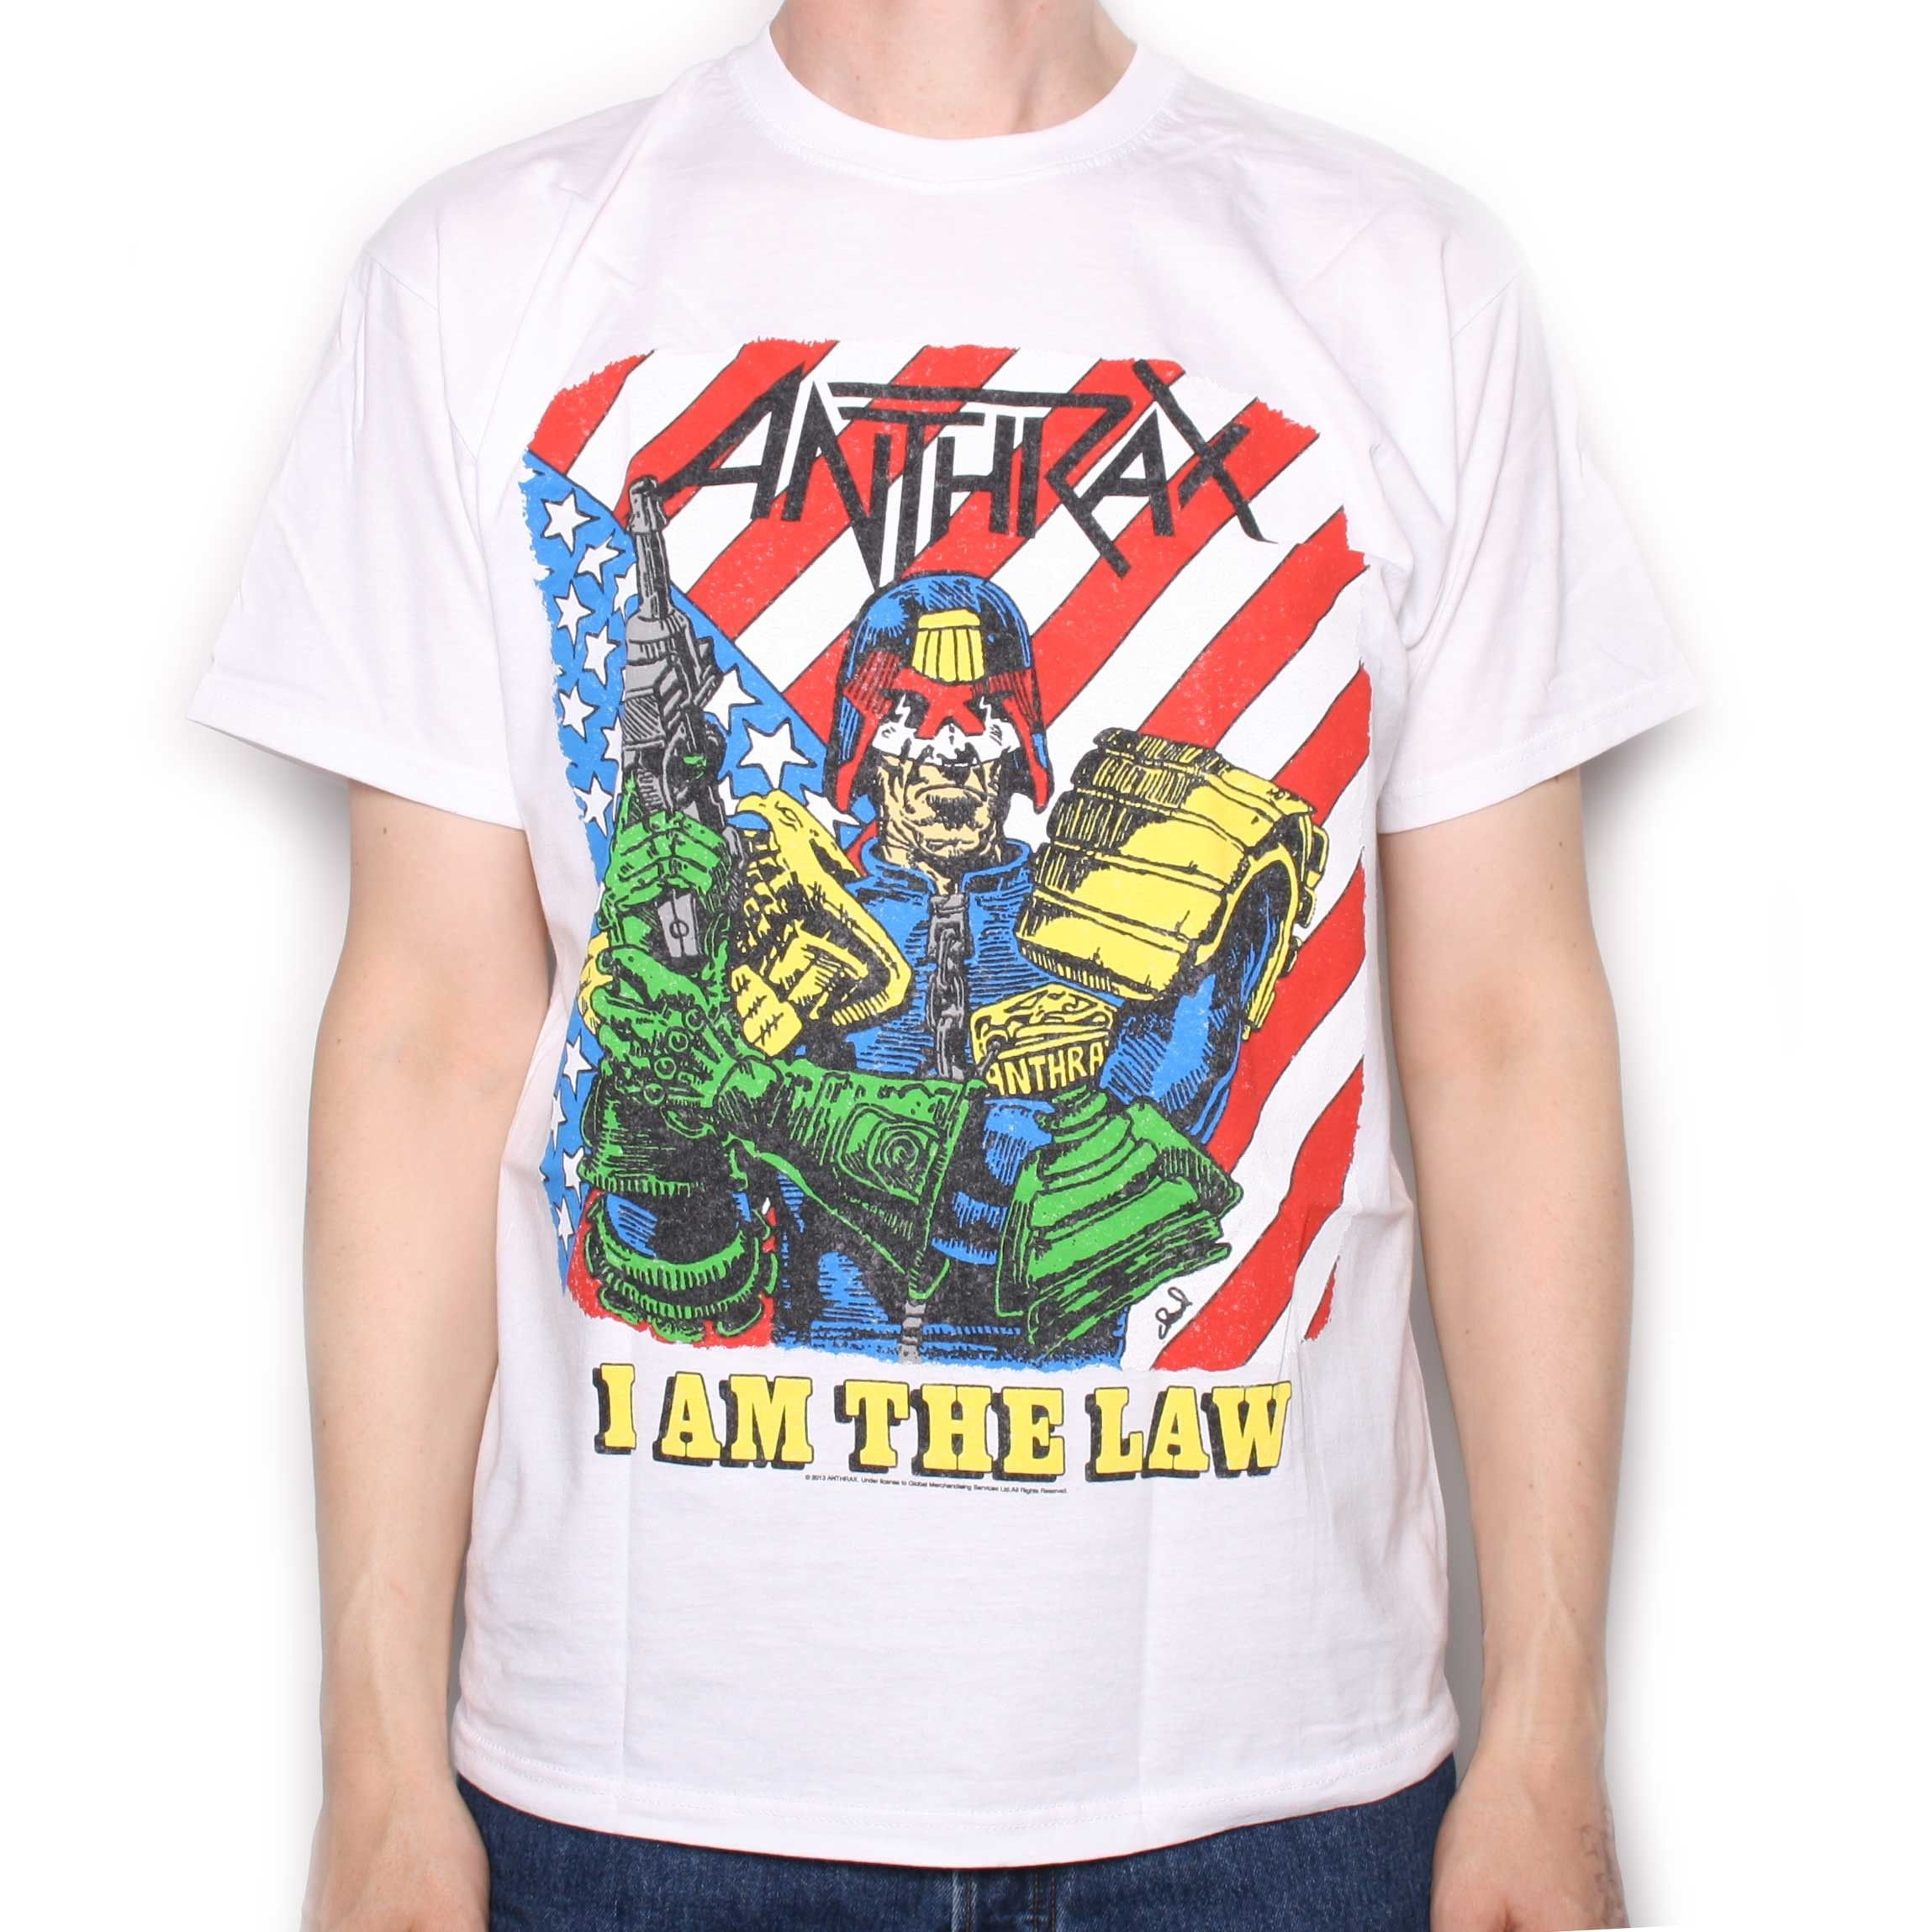 e1cb25c6c Anthrax T Shirt - I Am The Law 100% Official Cultura Pop